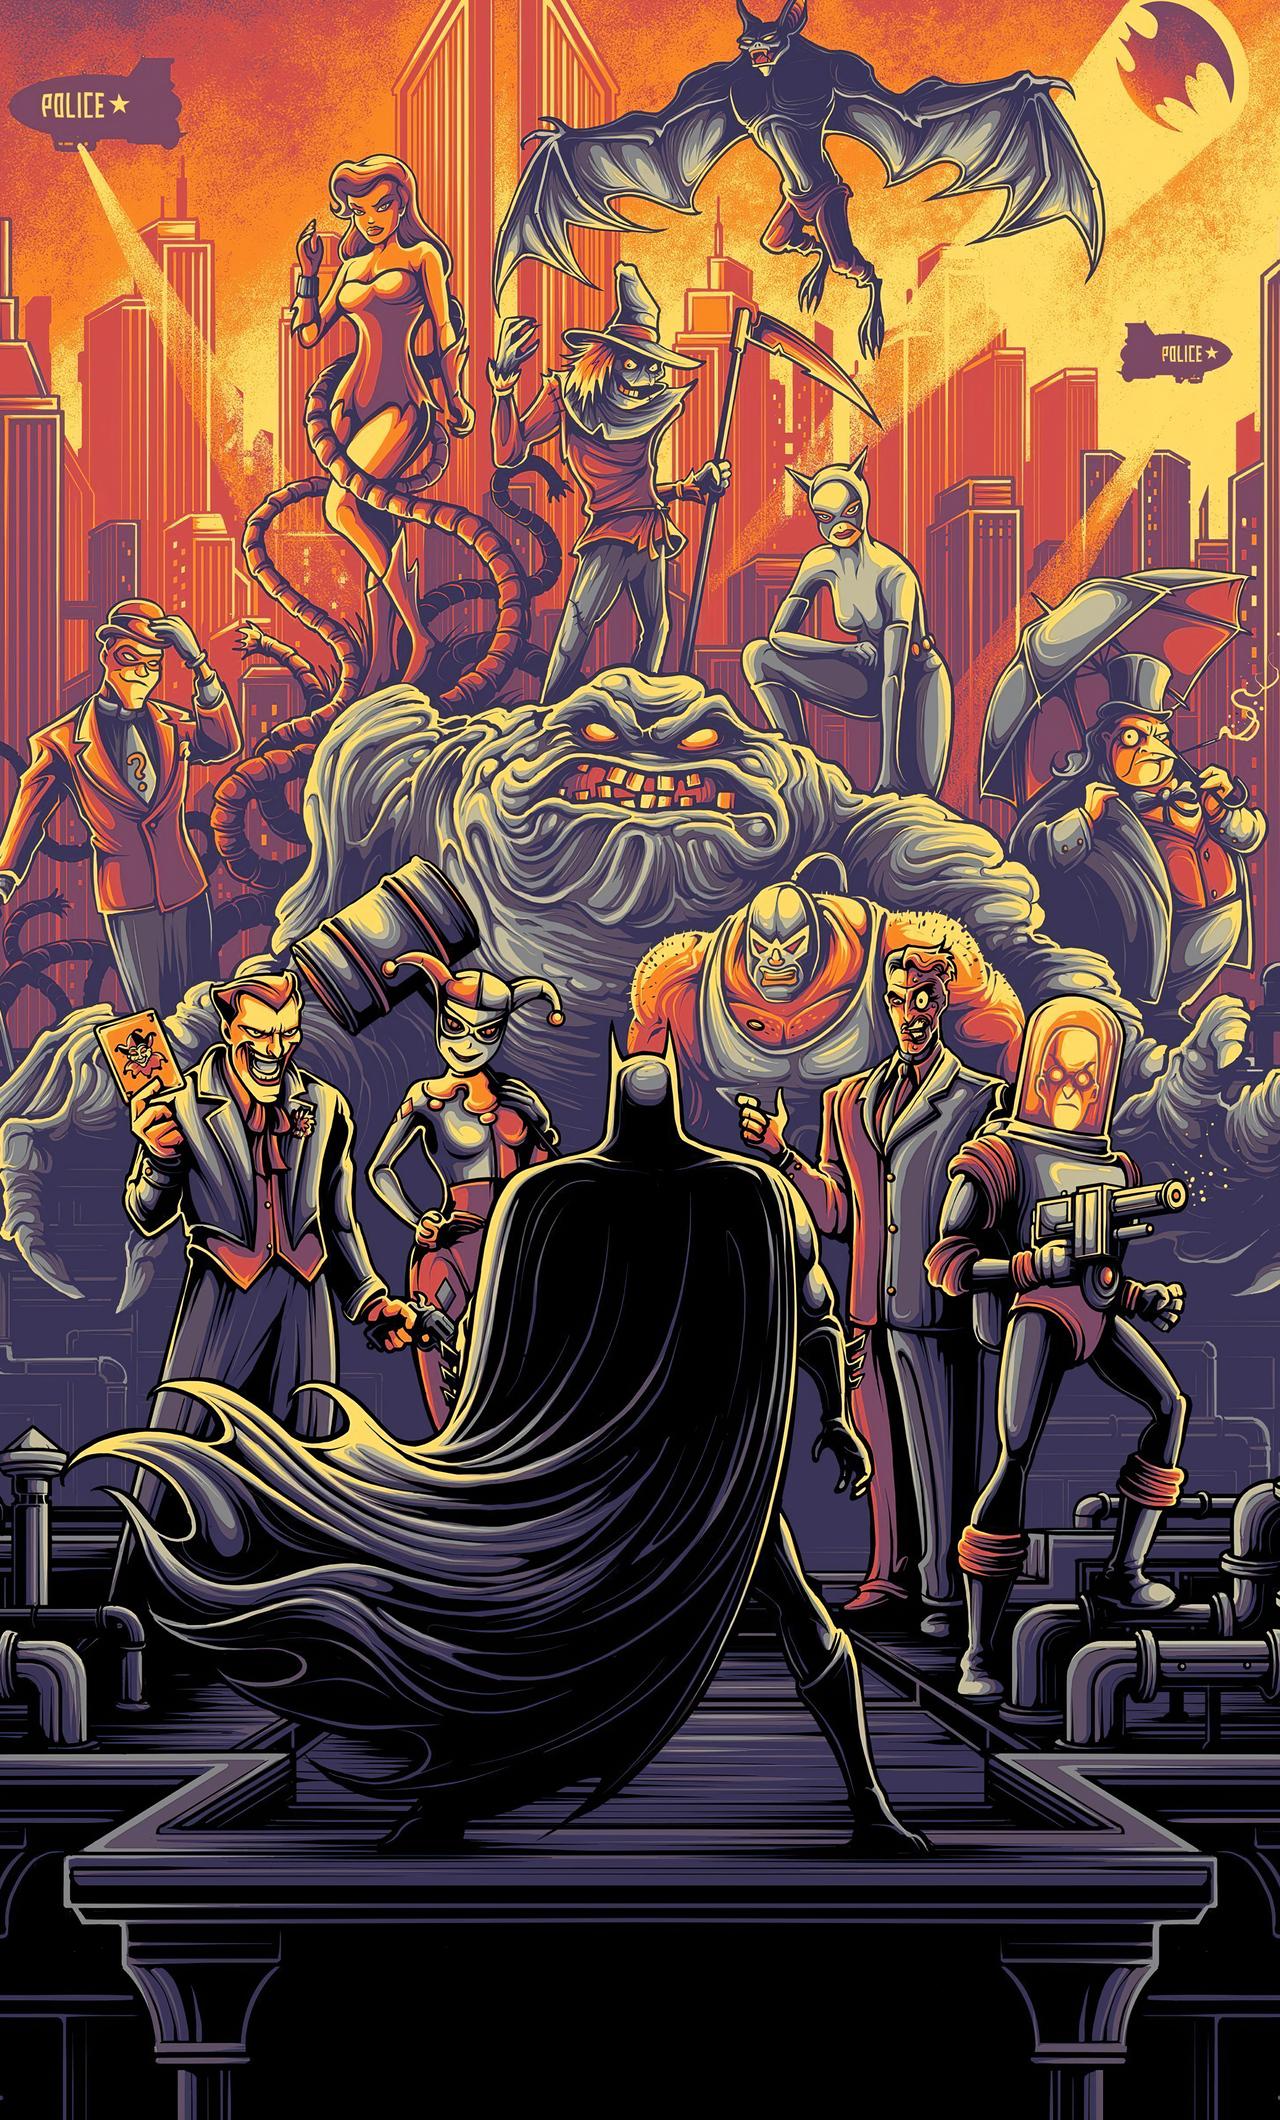 Batman Animated Series Iphone 1280x2120 Download Hd Wallpaper Wallpapertip